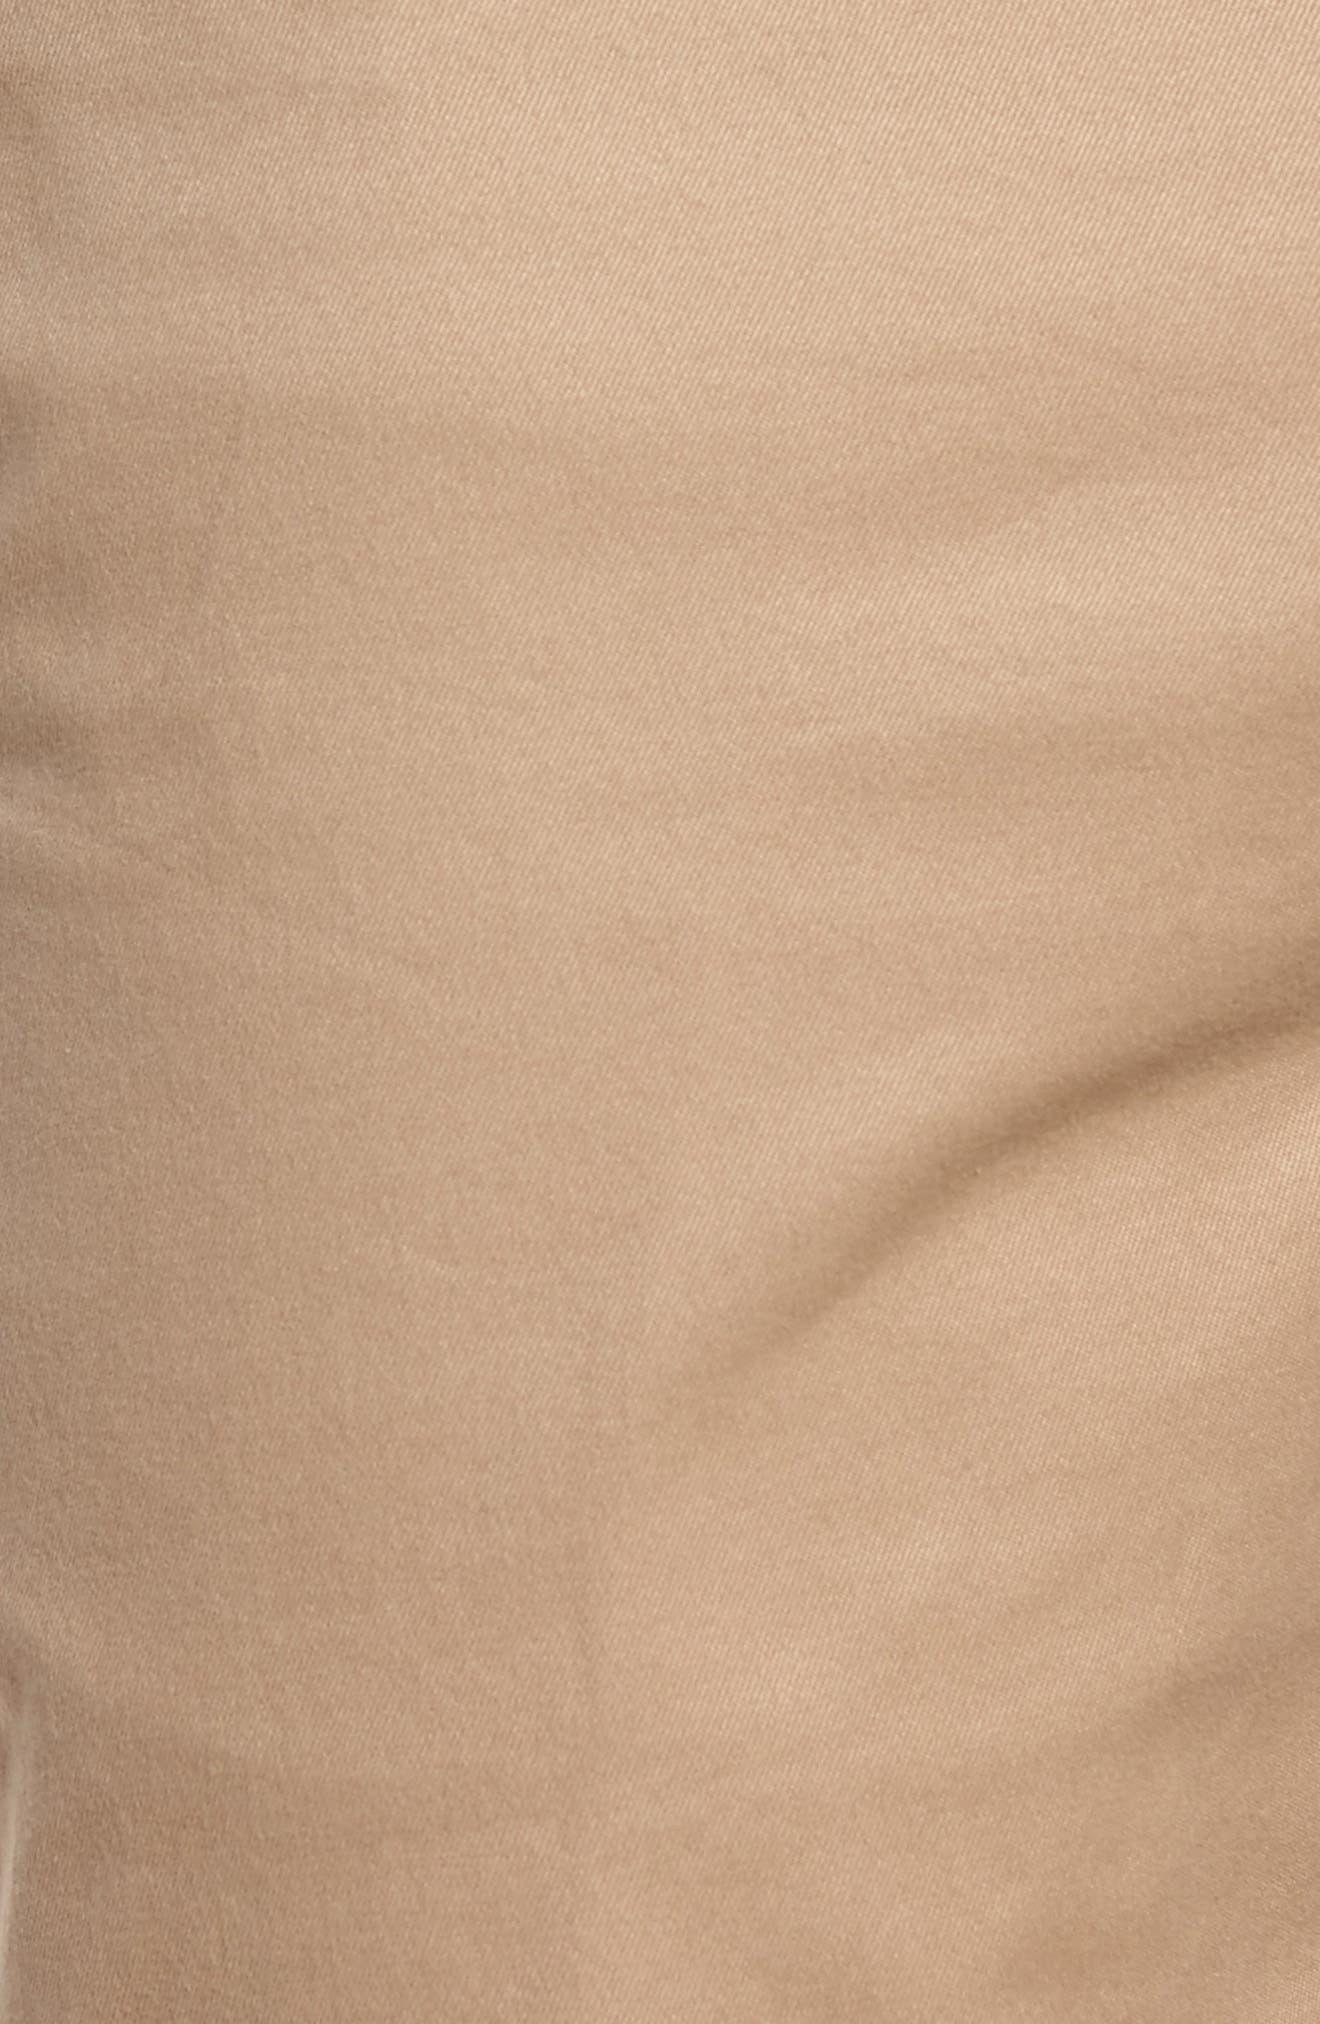 Slim Fit Chino Shorts,                             Alternate thumbnail 5, color,                             Kraft Beige